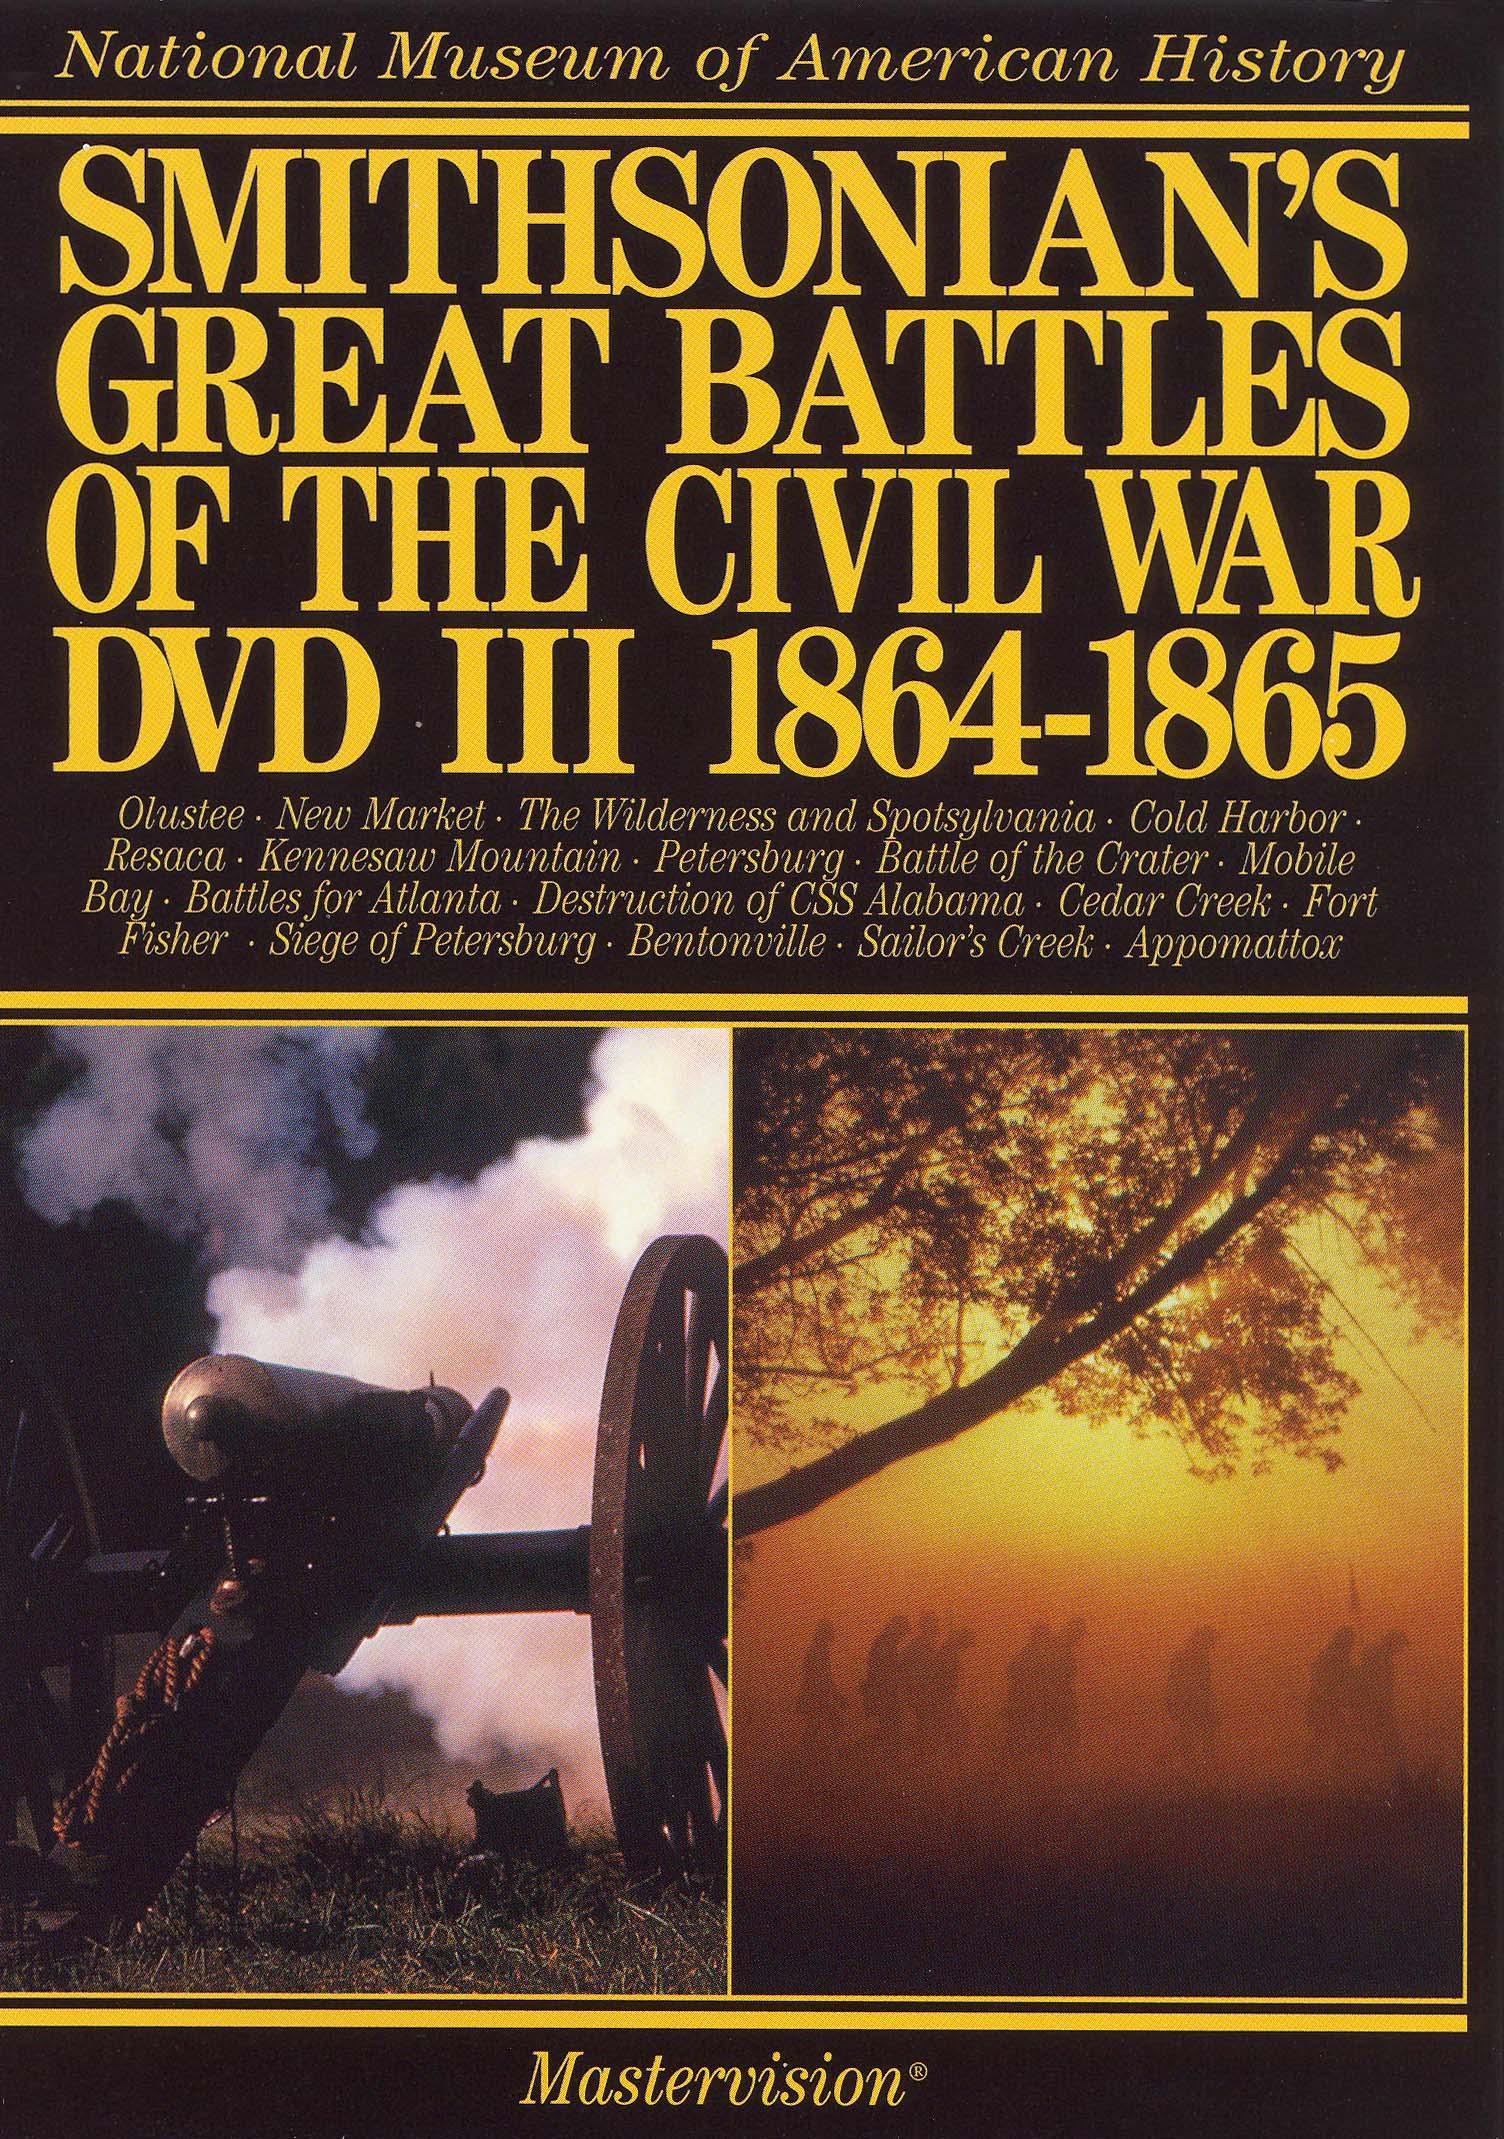 Smithsonian's Great Battles of the Civil War, Vol. 3